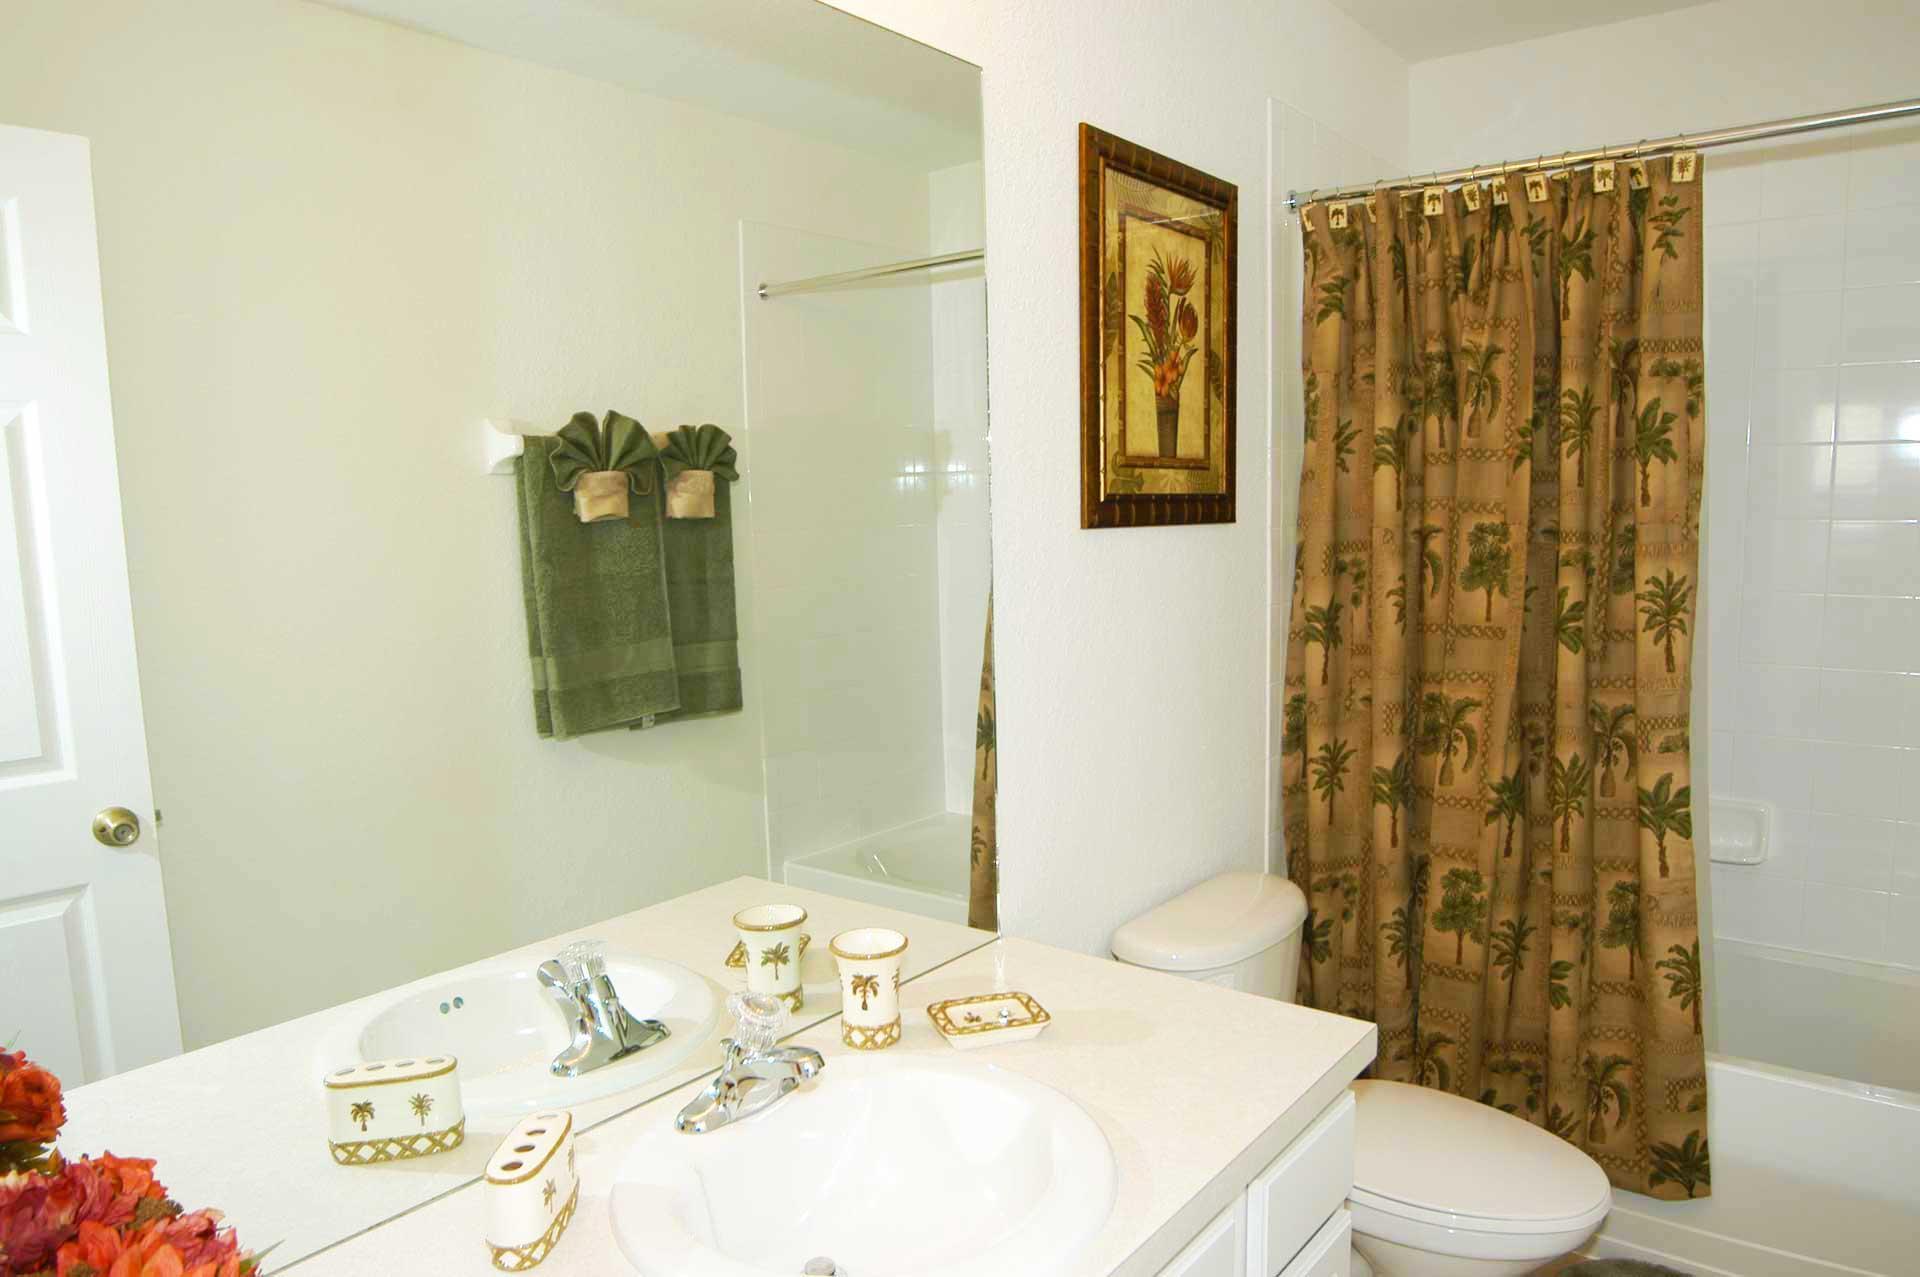 Lion KIng Themed Bathroom Suite